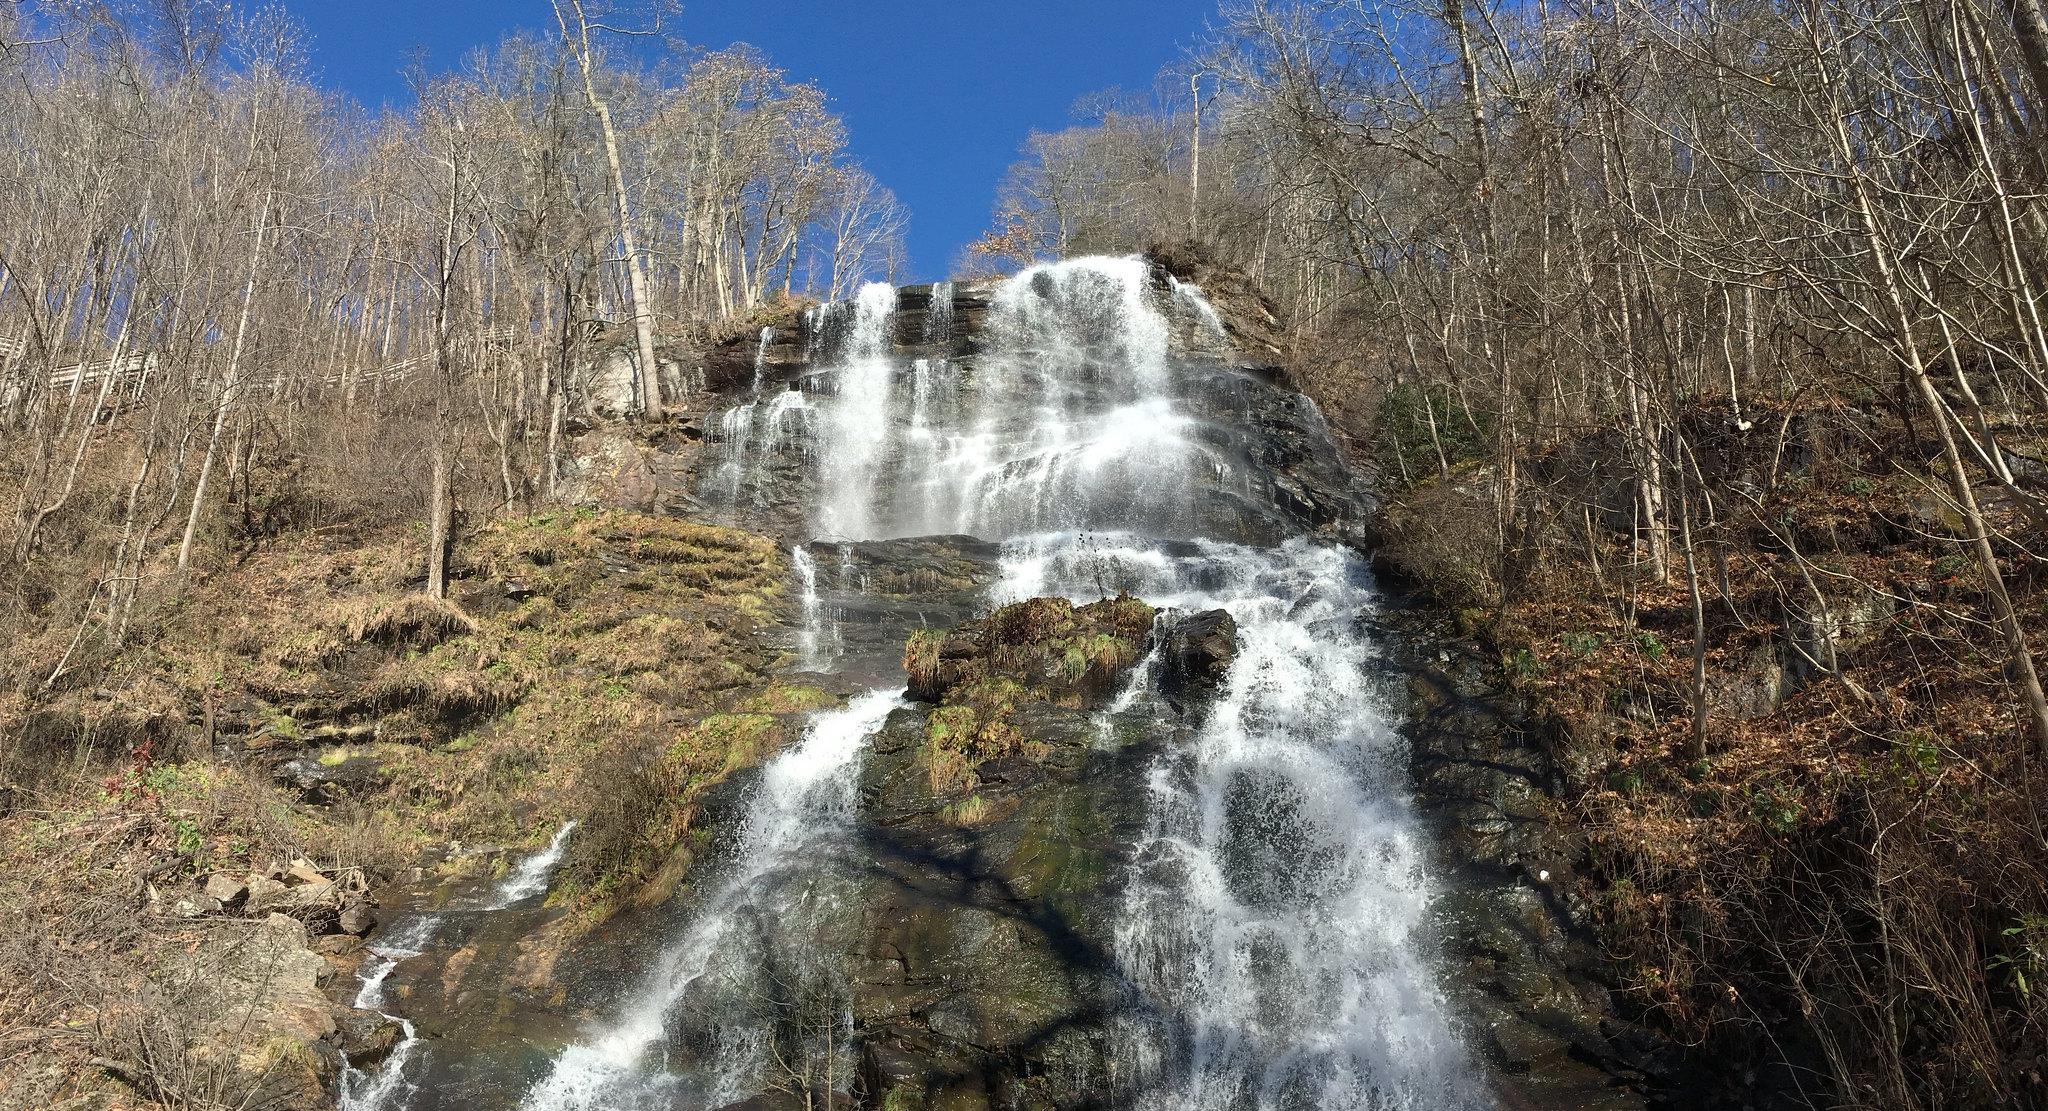 Amicalola falls crest